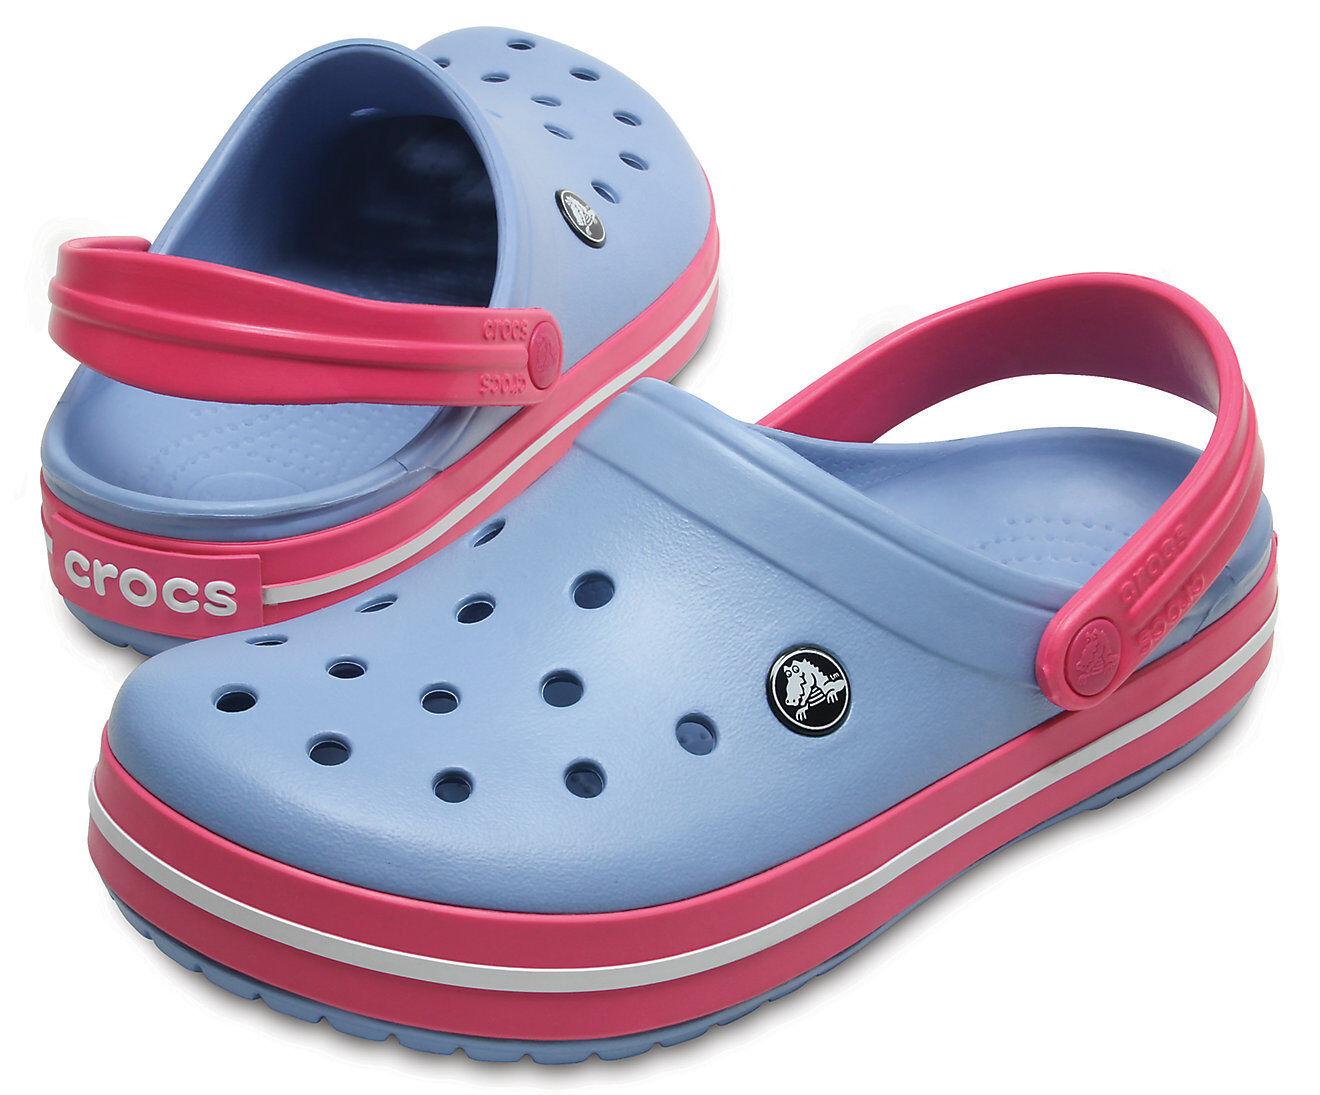 Crocs Crocband Zapatillas Mujer - Celeste Fucsia Fucsia Fucsia - 11016  Con precio barato para obtener la mejor marca.